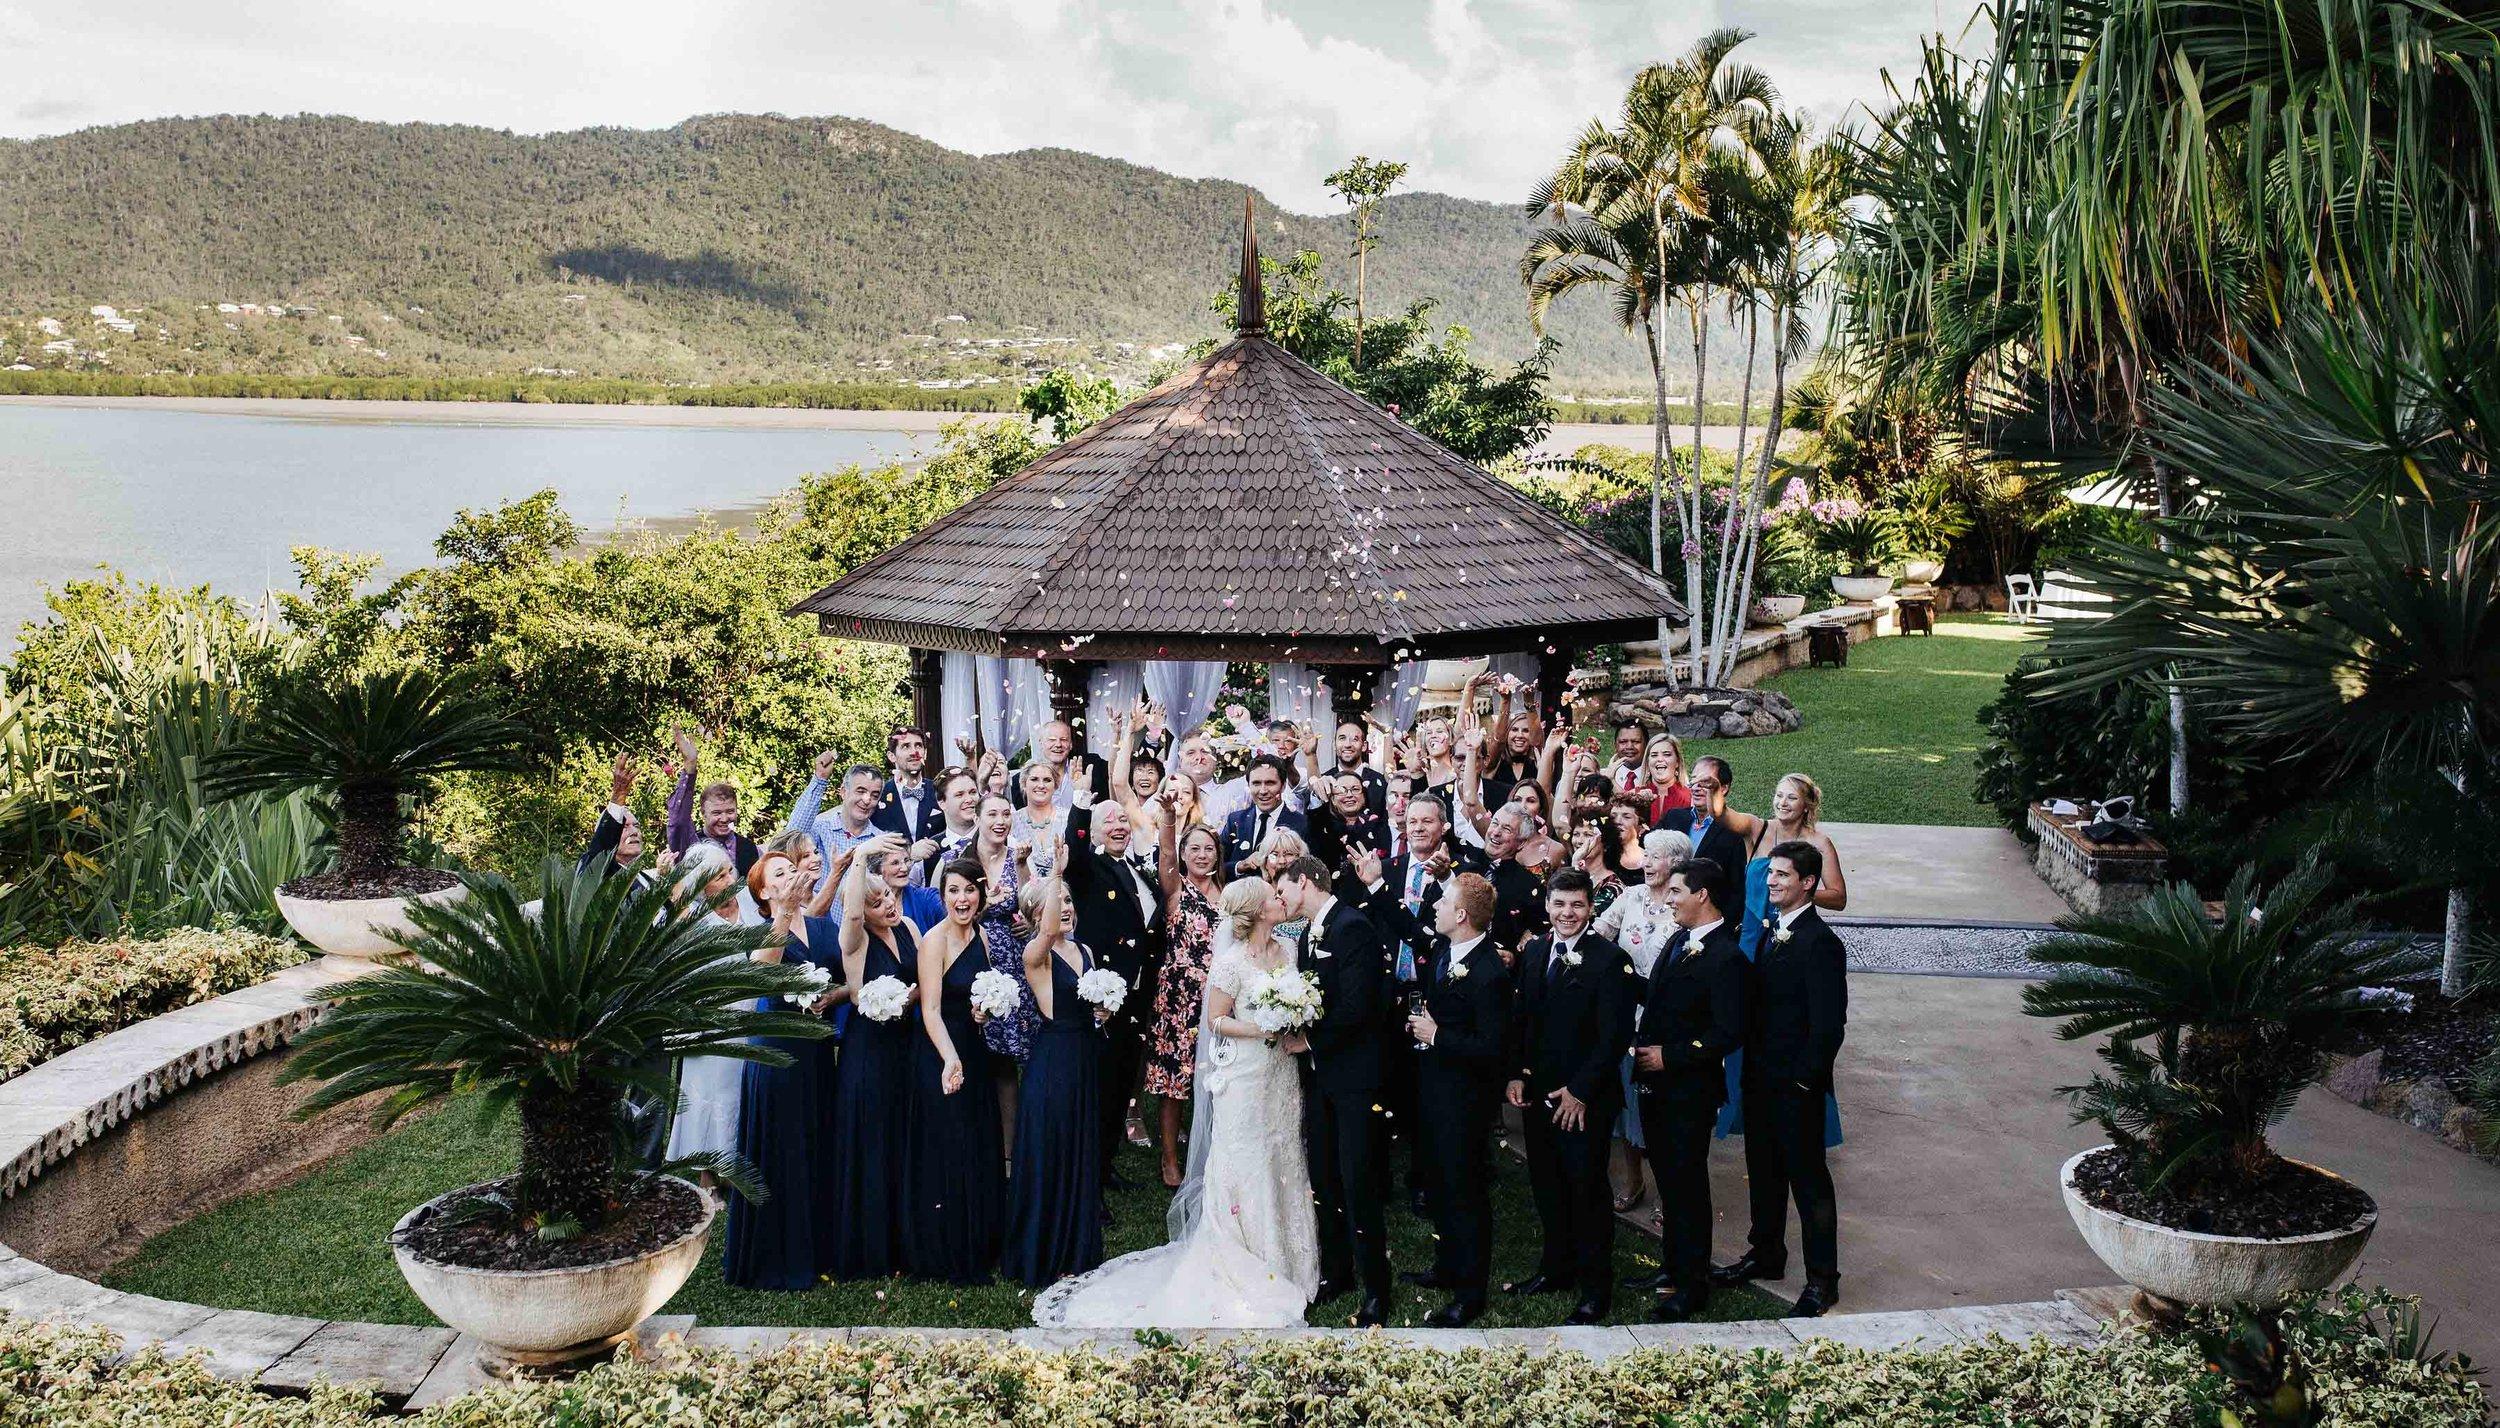 lrKaitlin-Reece-Villa-Botanica-wedding-photography-Playback-Studios321of708.jpg